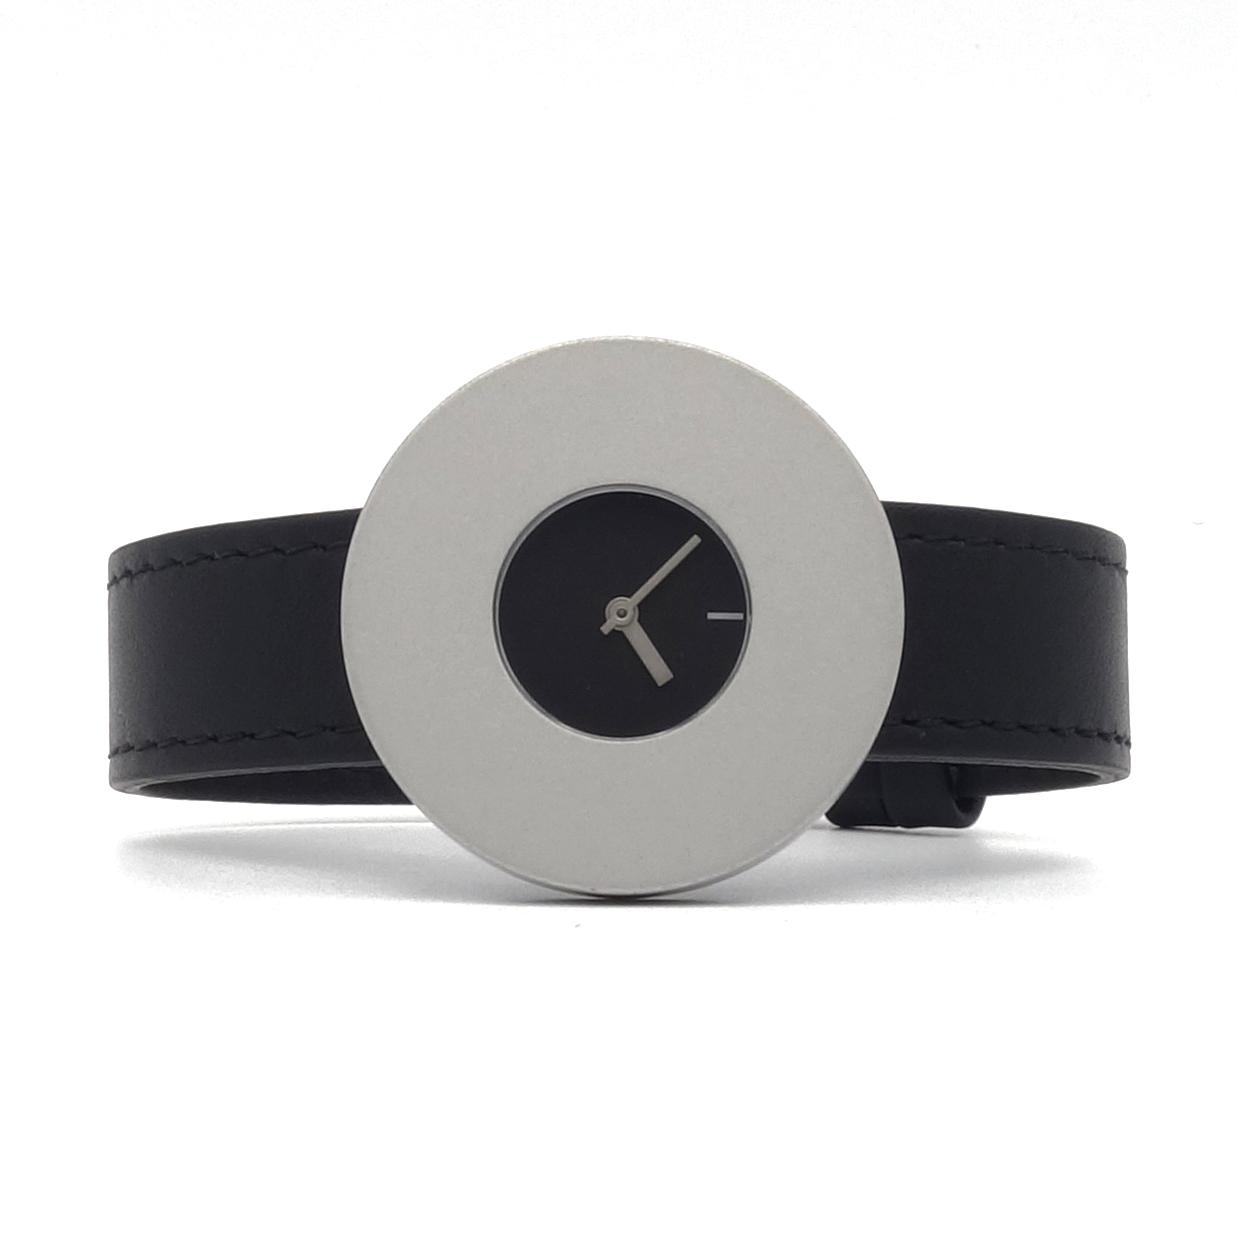 strak design horloge